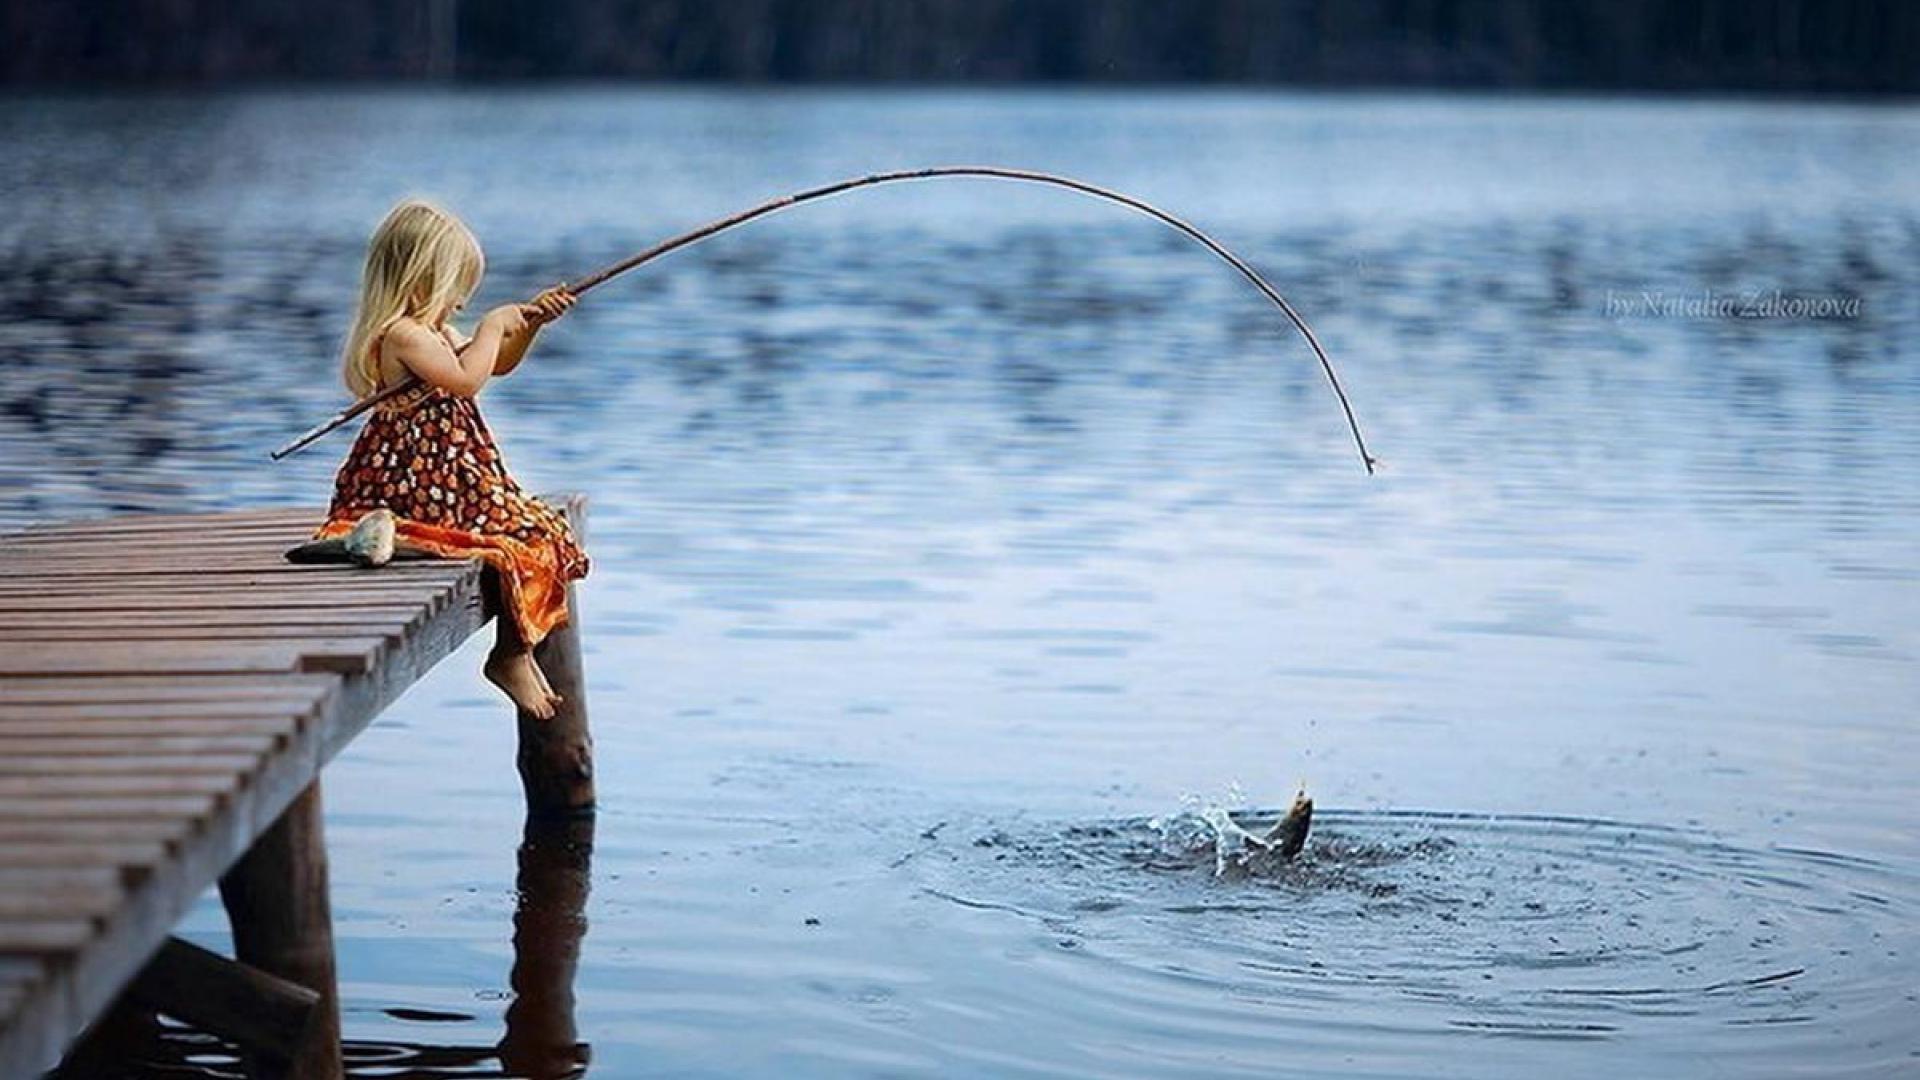 Fishing HD Wallpapers 1